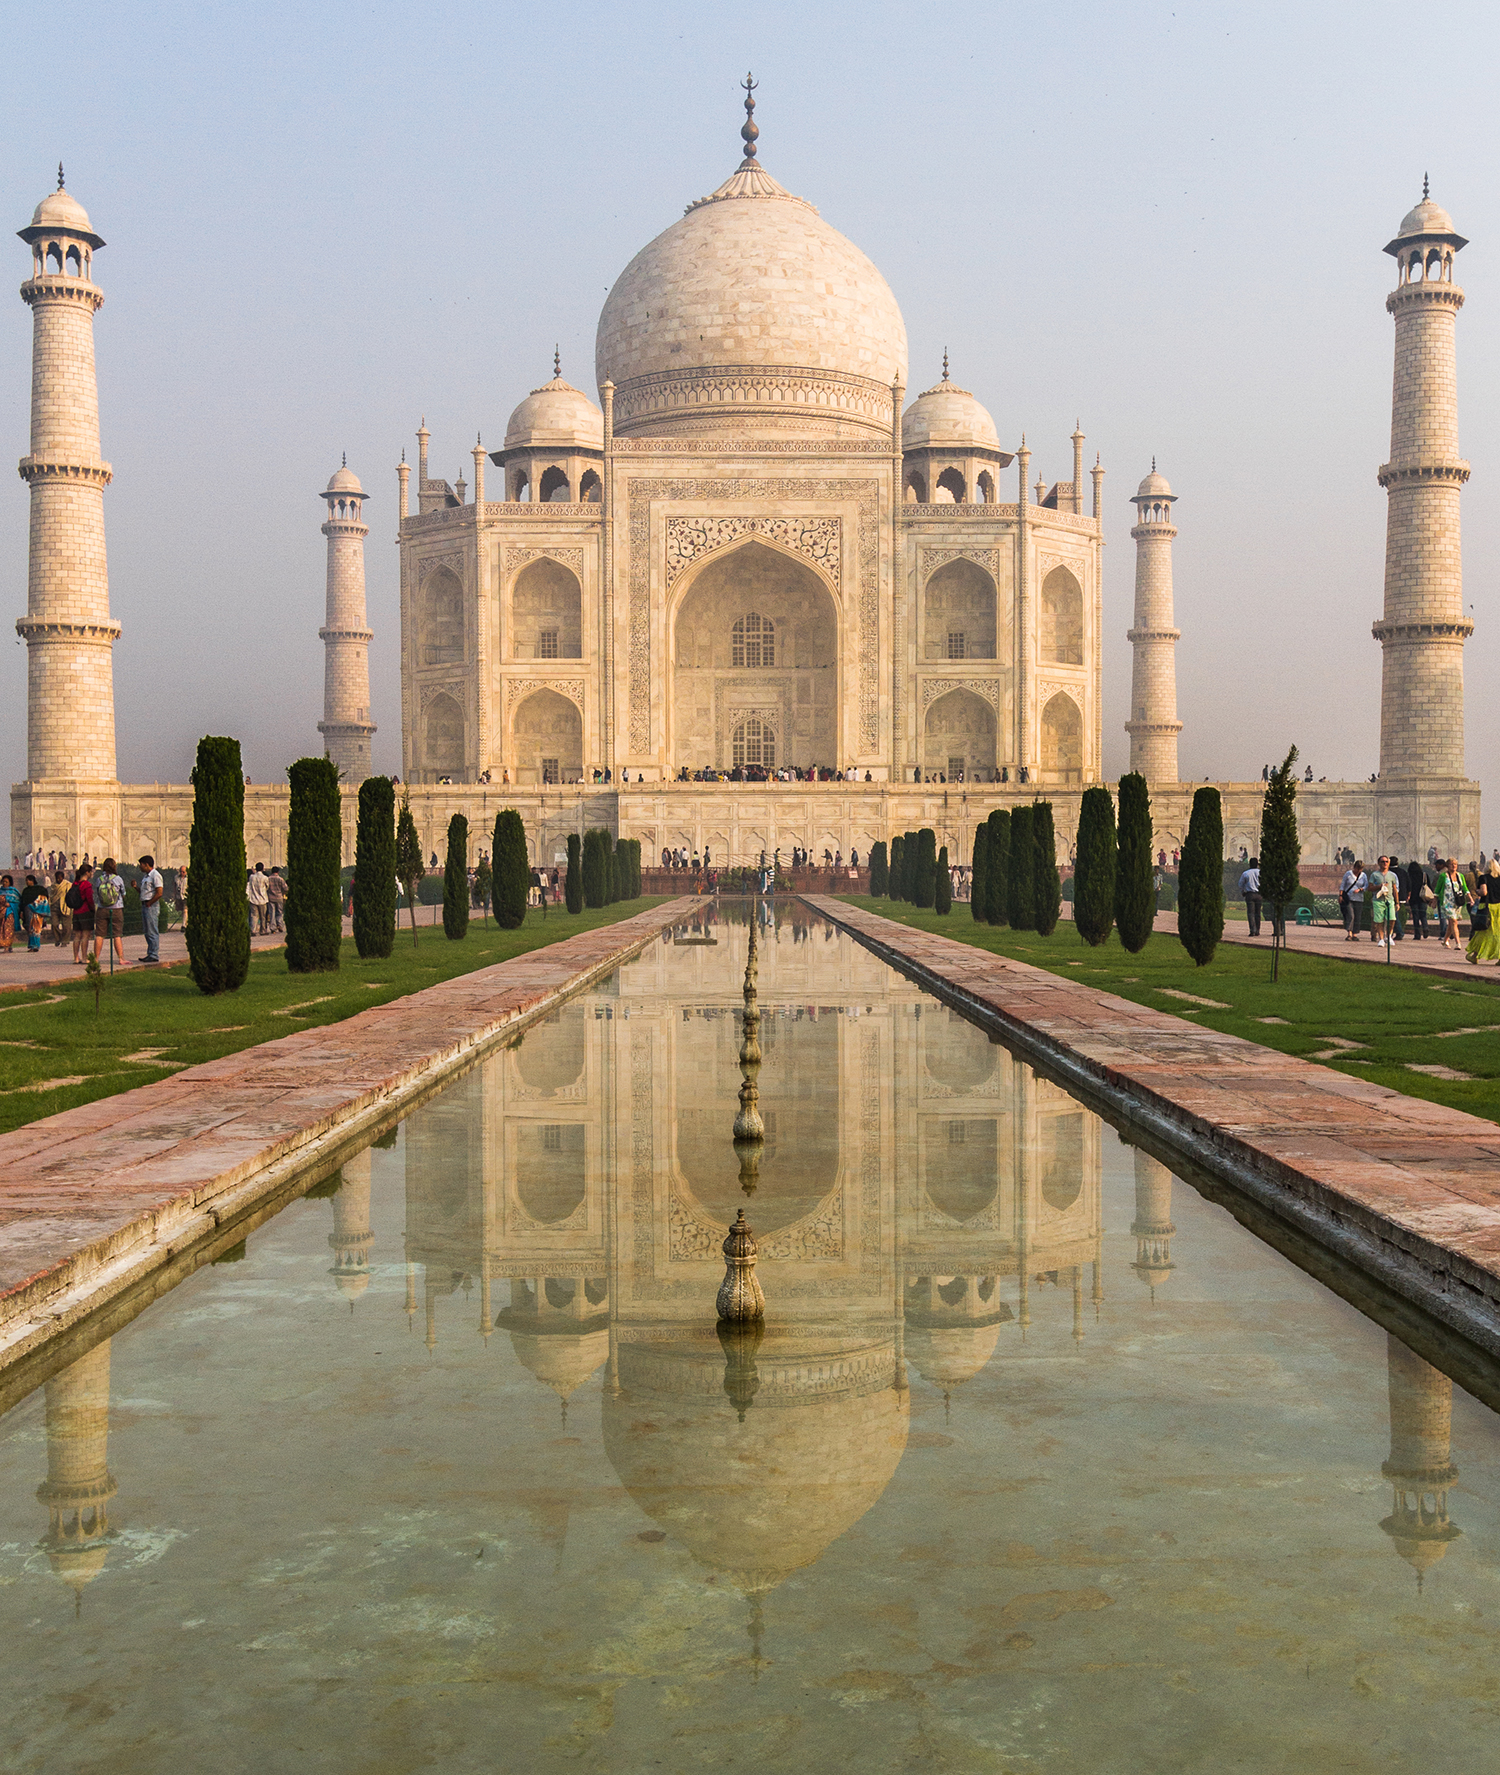 The Taj Mahal has classic rules for leading lines